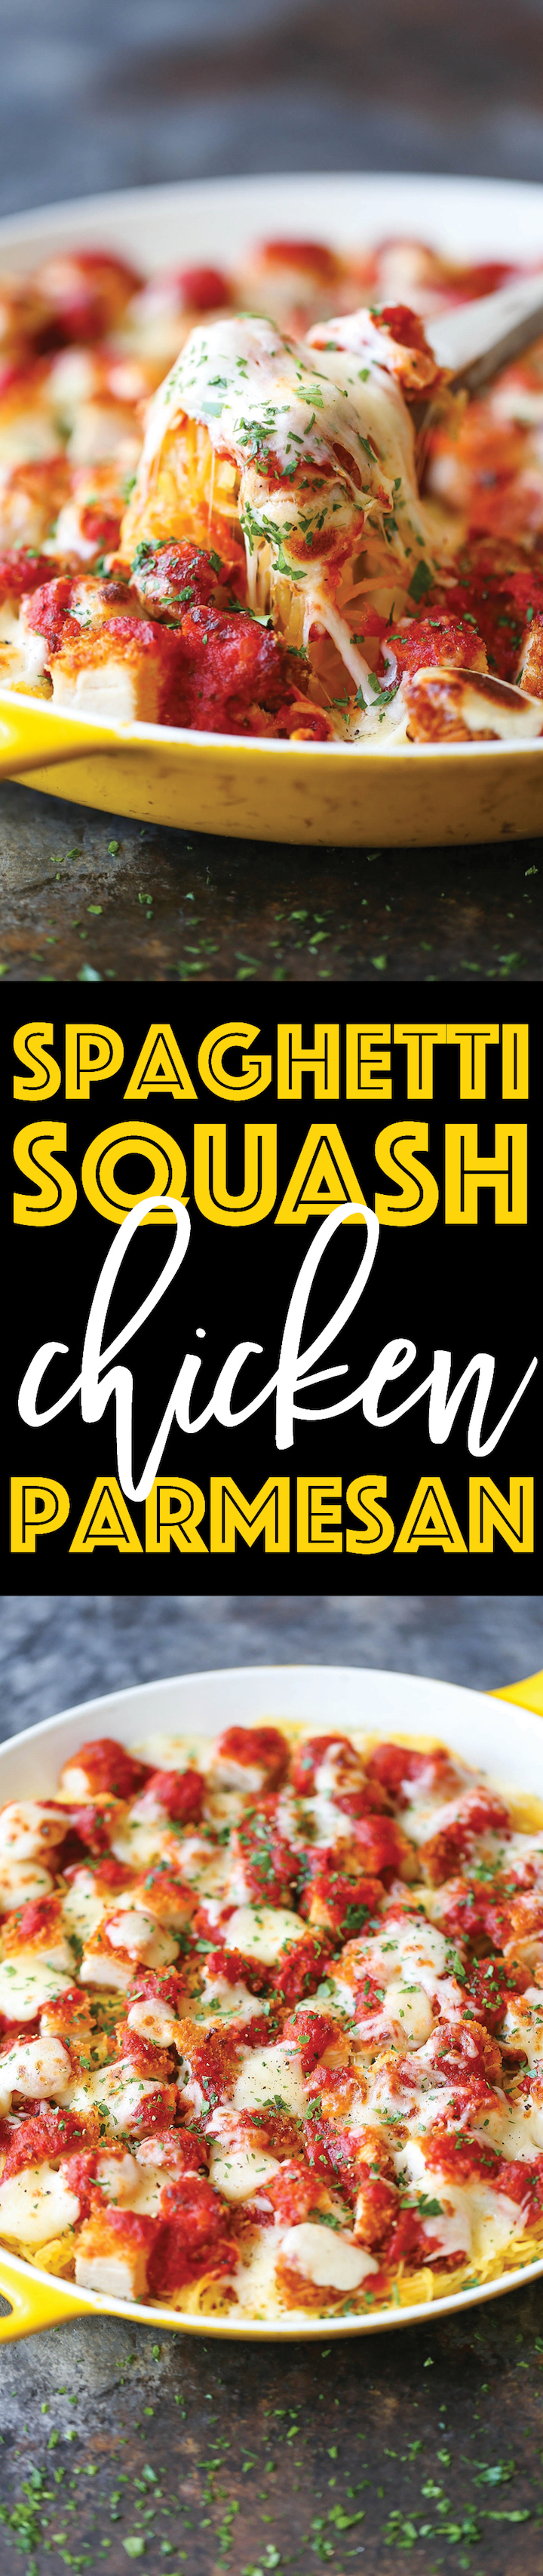 Spaghrtti Squash Chicken Parmesan